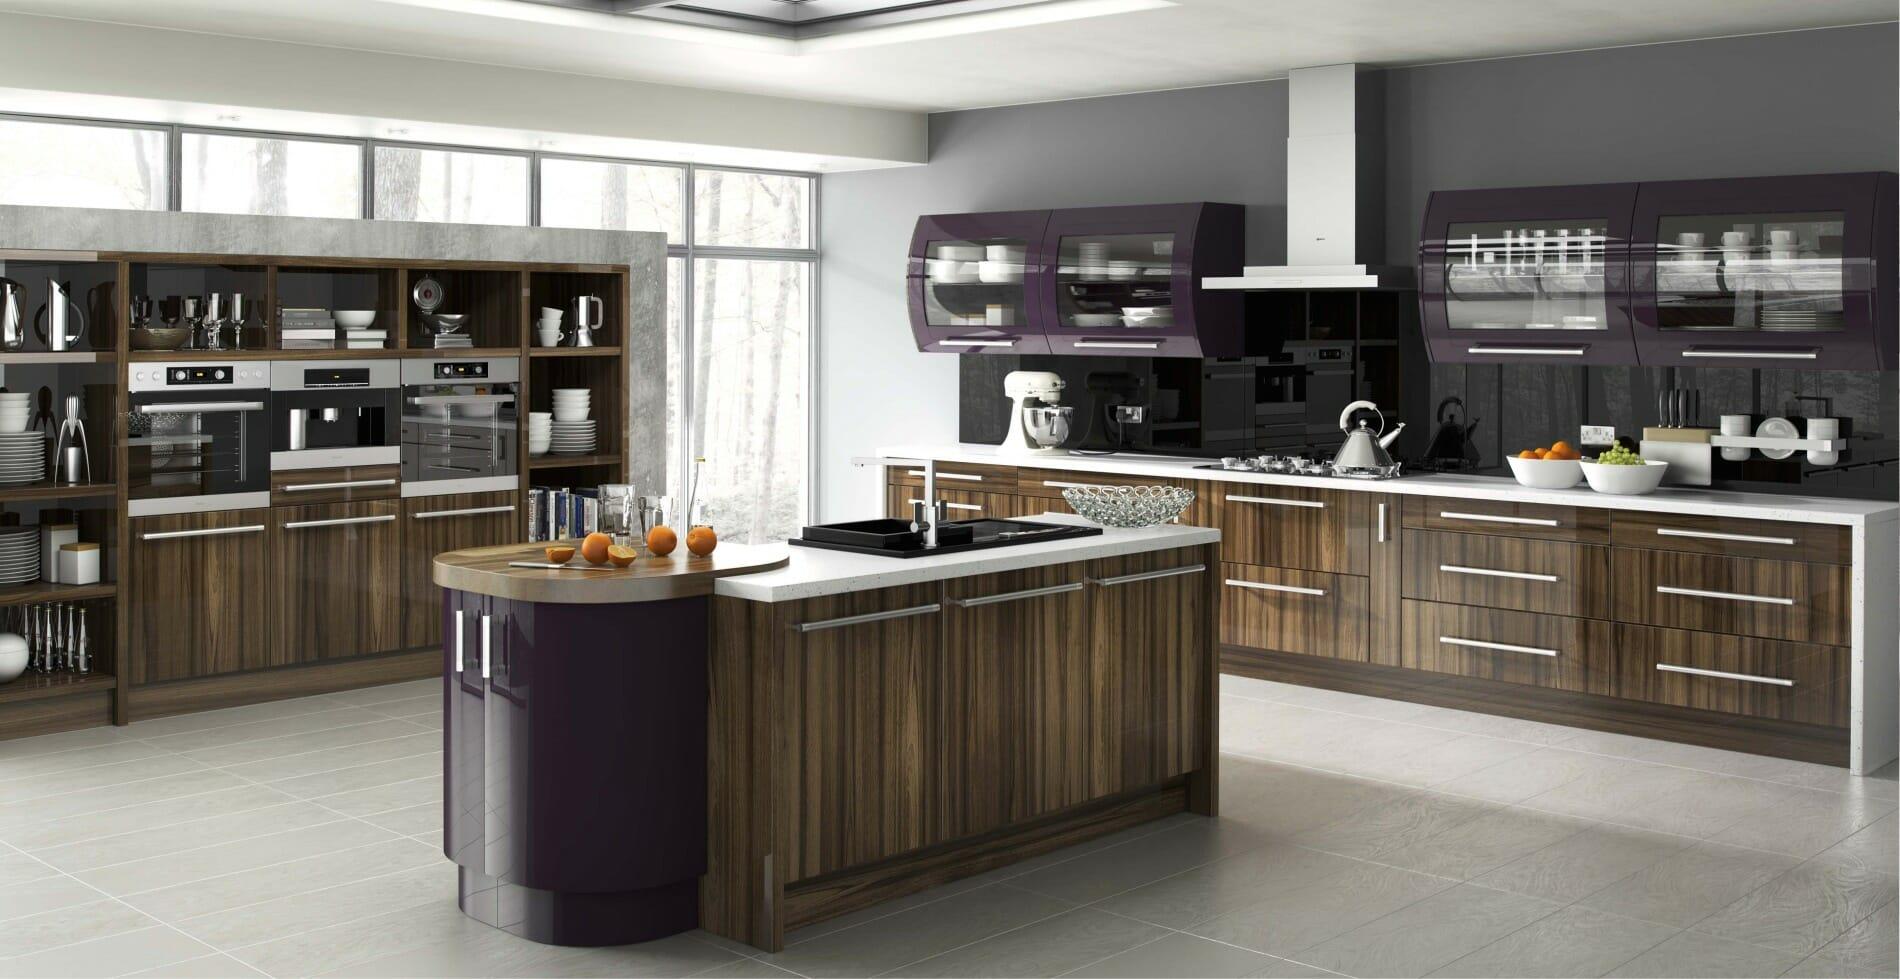 High gloss kitchens mastercraft kitchens - Duleek Tiepolo Aubergine